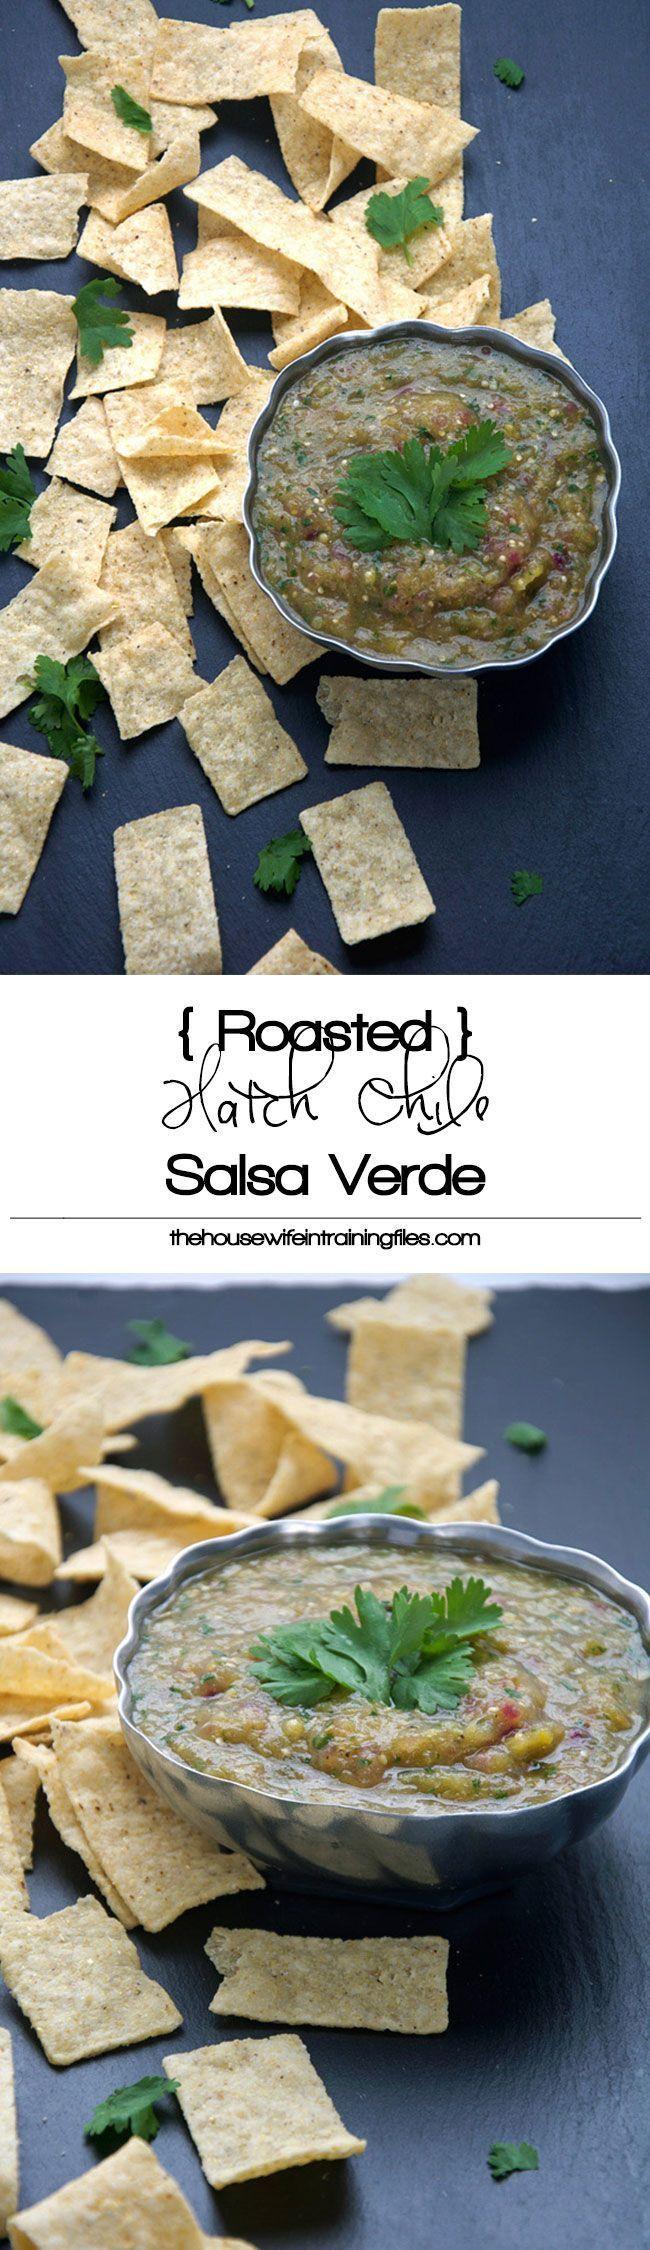 Salsa Verde Recipe, Salsa Verde Recipe, Tomatillo, Tomato, Spicy, Roasted, Easy, Homemade, Authentic, Green, Dip, Mexicana, Sauce https://www.pinterest.com/pin/113012271883535531/